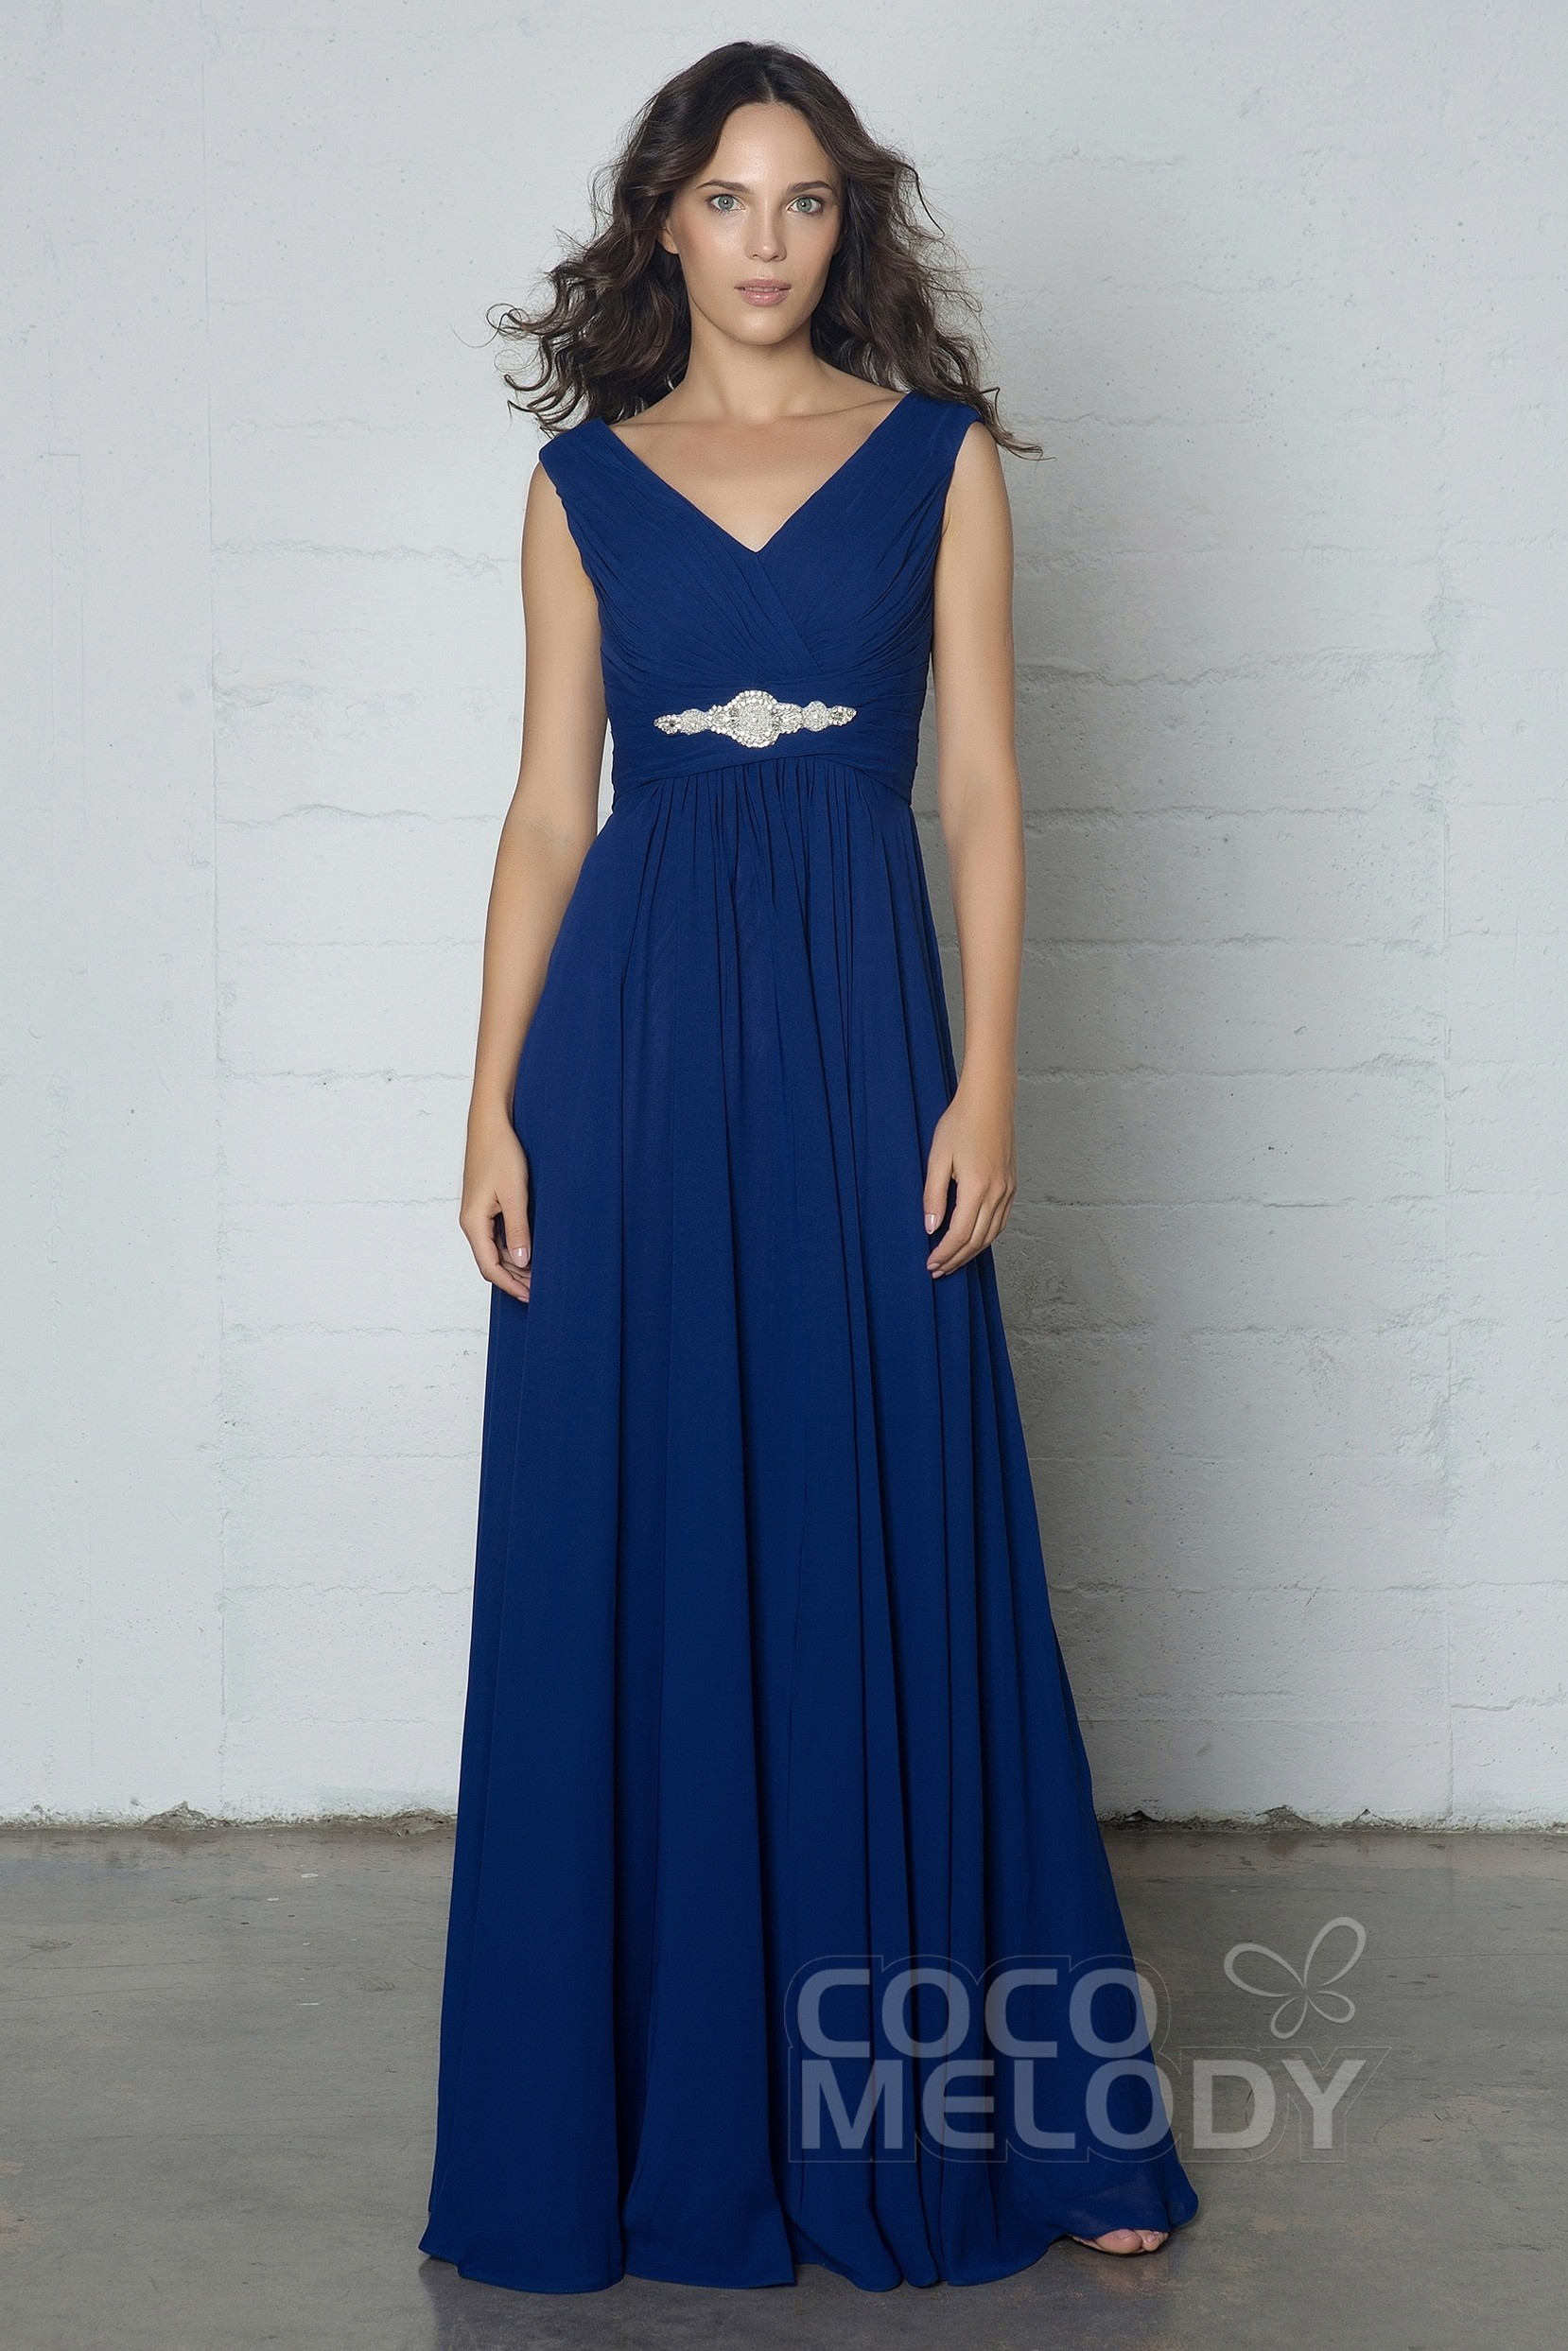 7e287545a7 Hot Sale Sheath-Column V-Neck Natural Floor Length Chiffon Sleeveless  Zipper Dress with